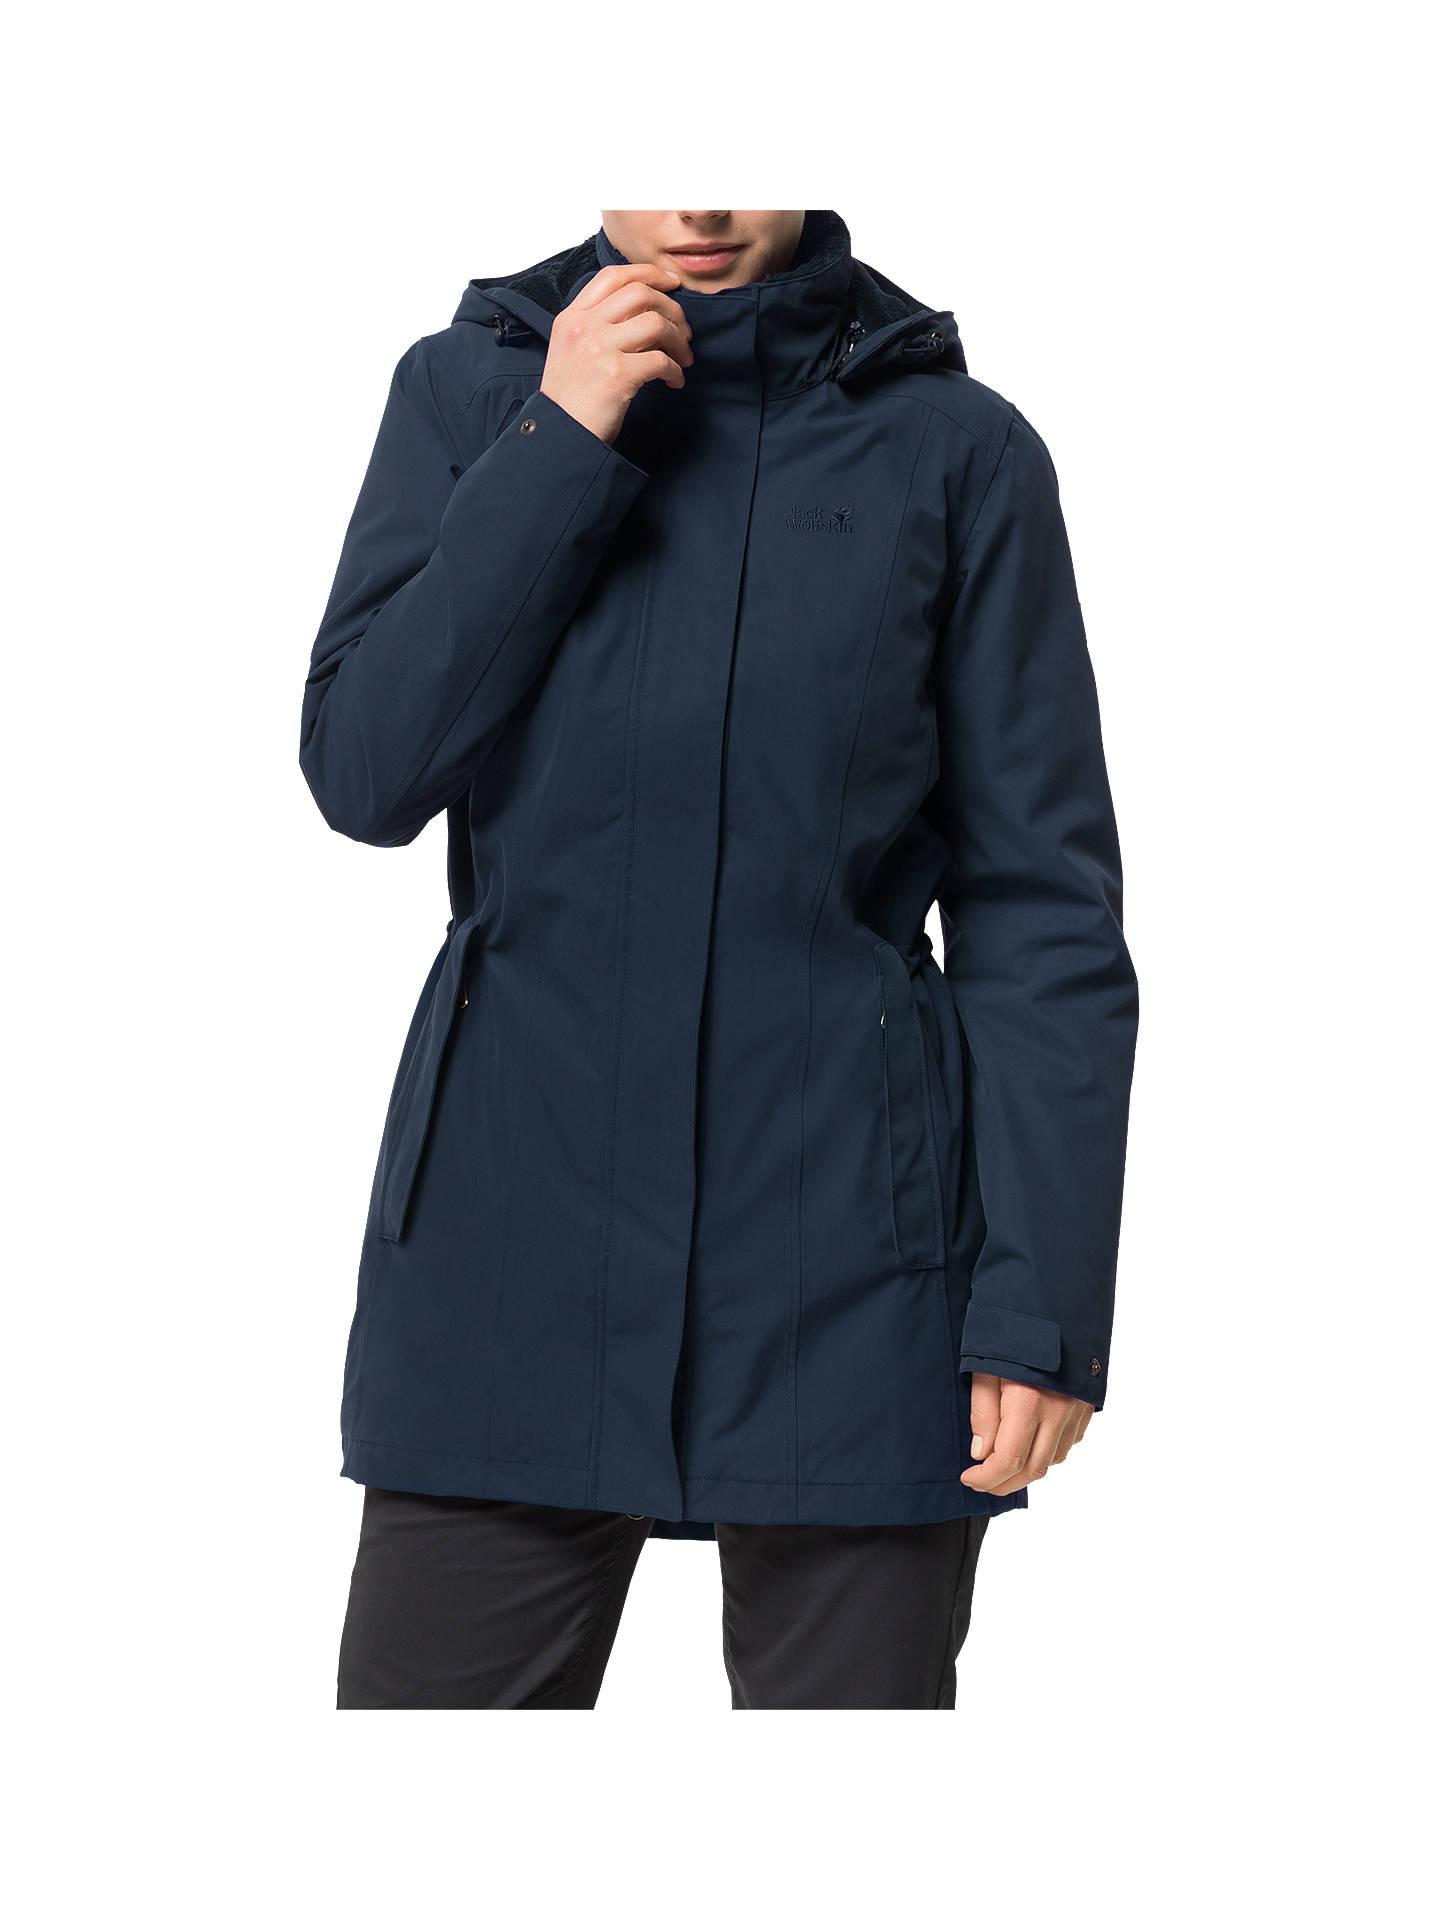 d6a7ac0683a Jack Wolfskin Madison Avenue Women's Coat, Blue at John Lewis & Partners